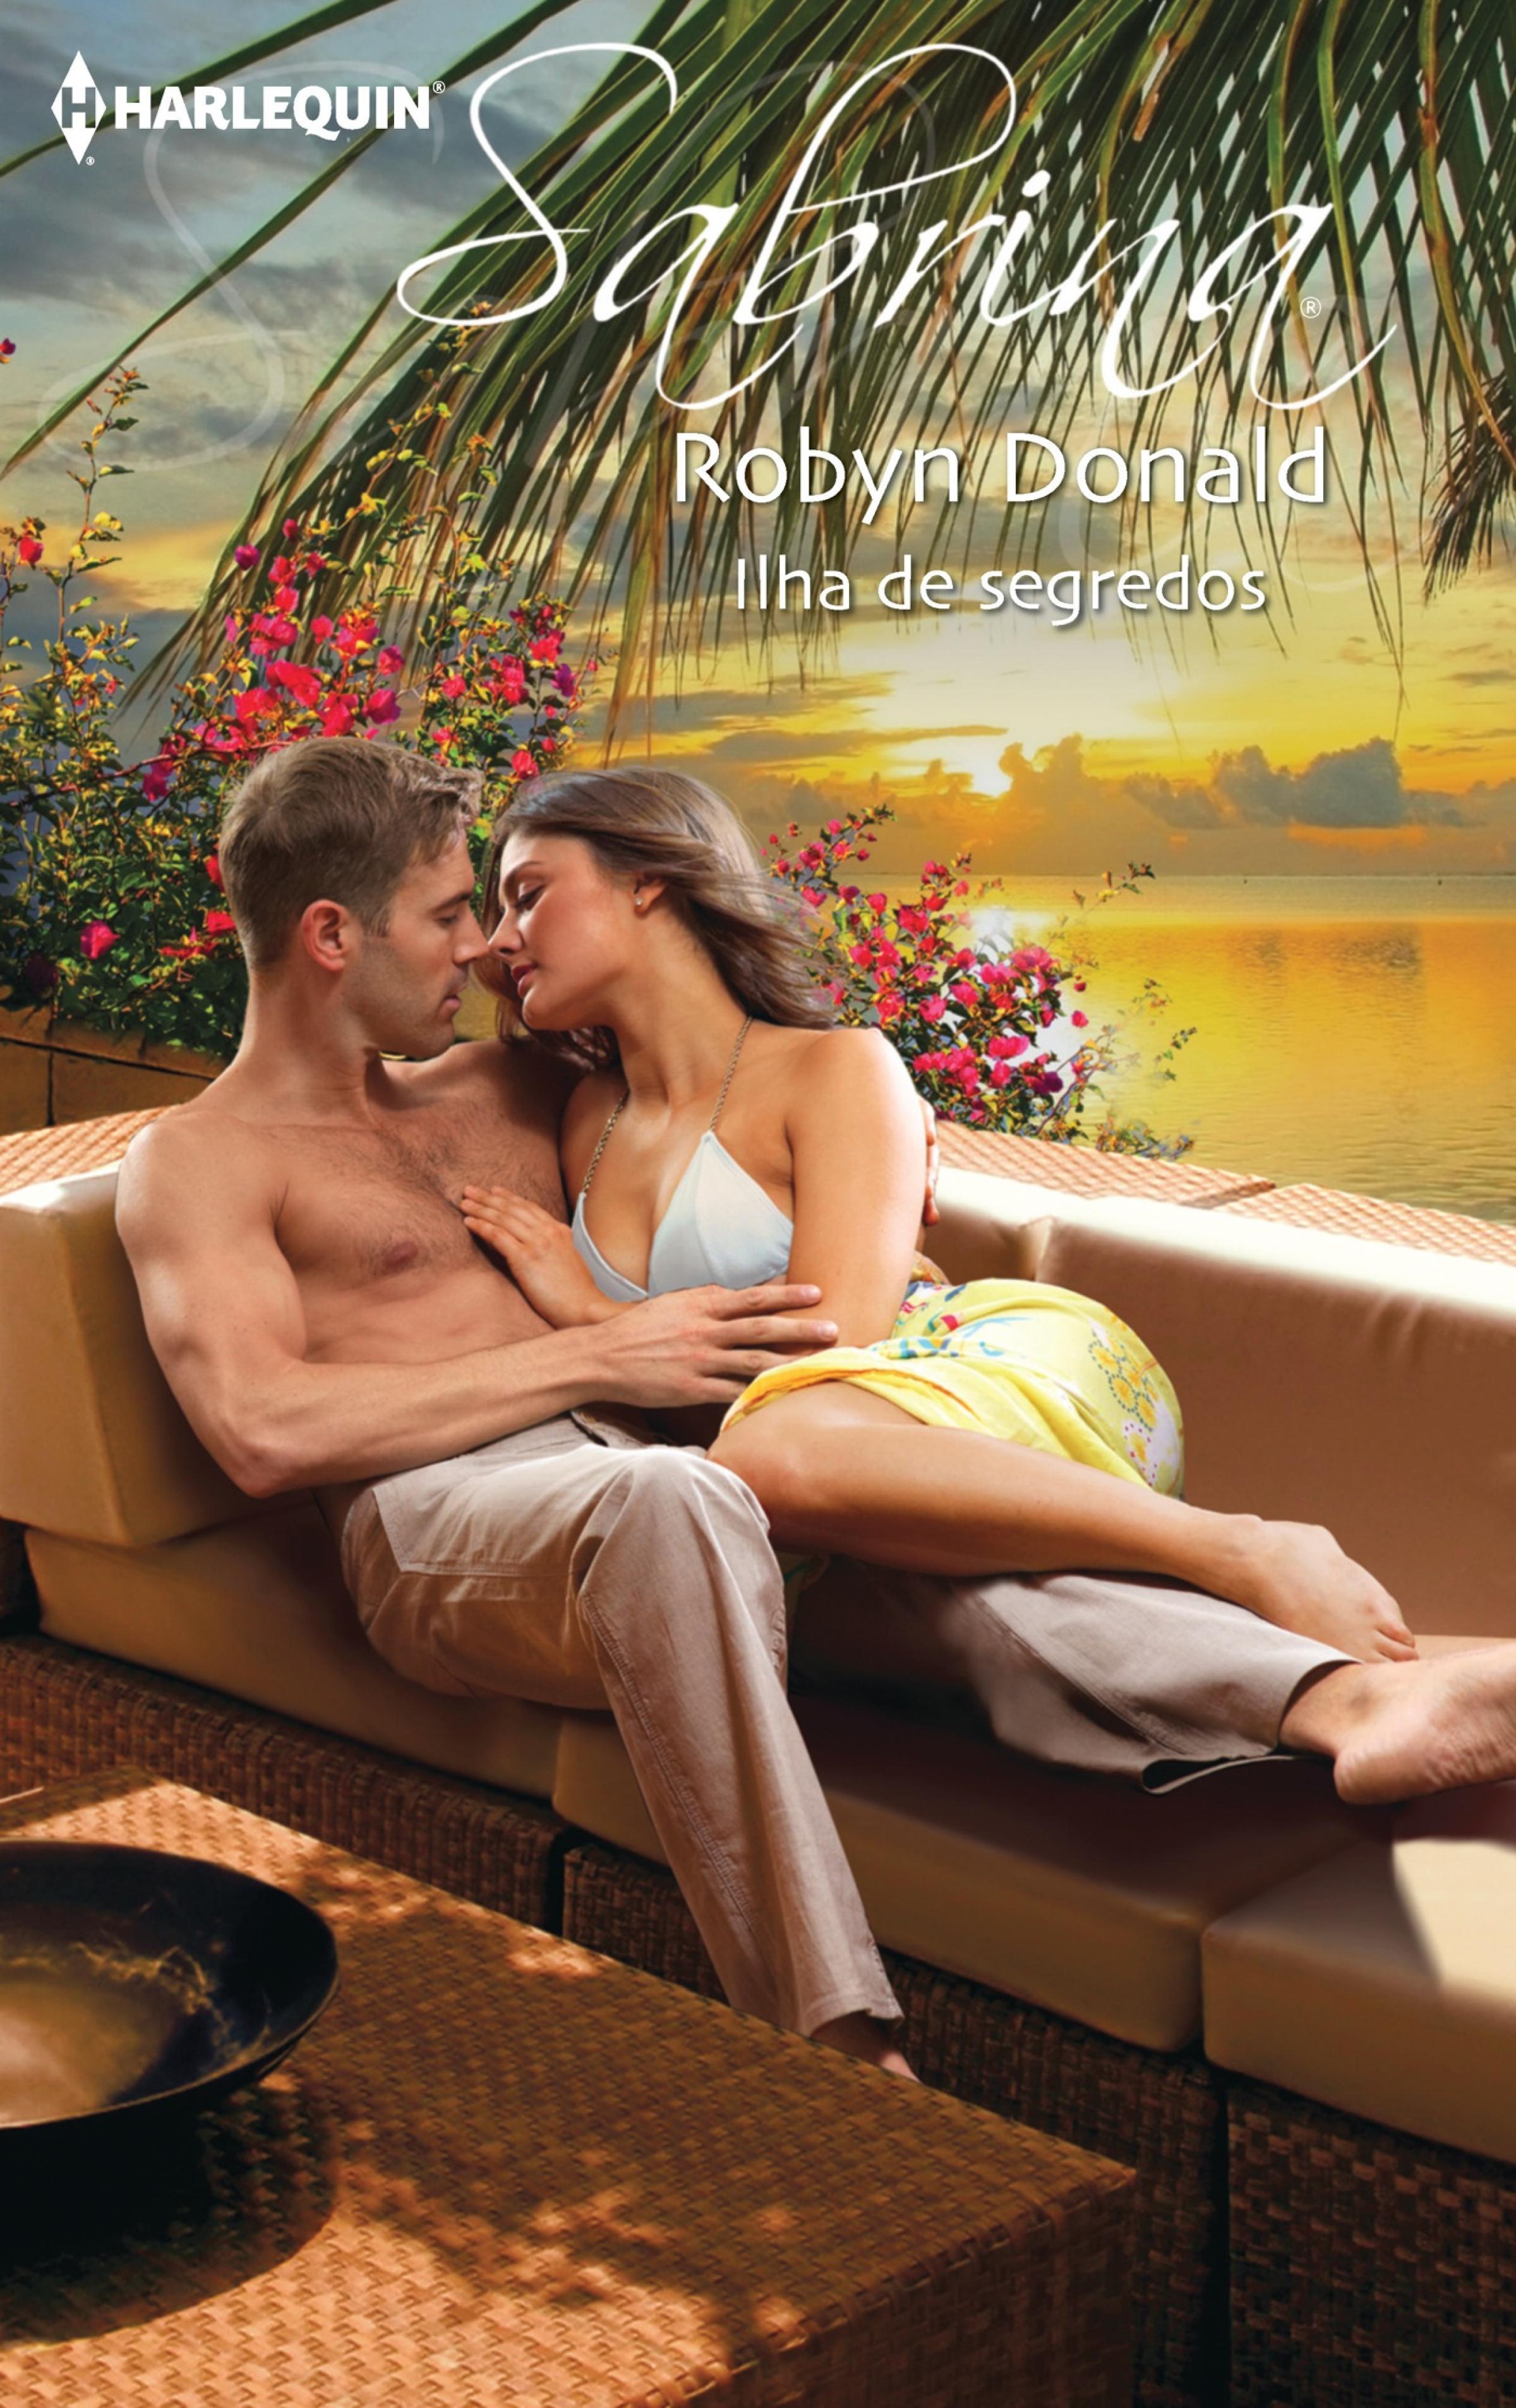 Robyn Donald Ilha de segredos robyn donald guerra de amor